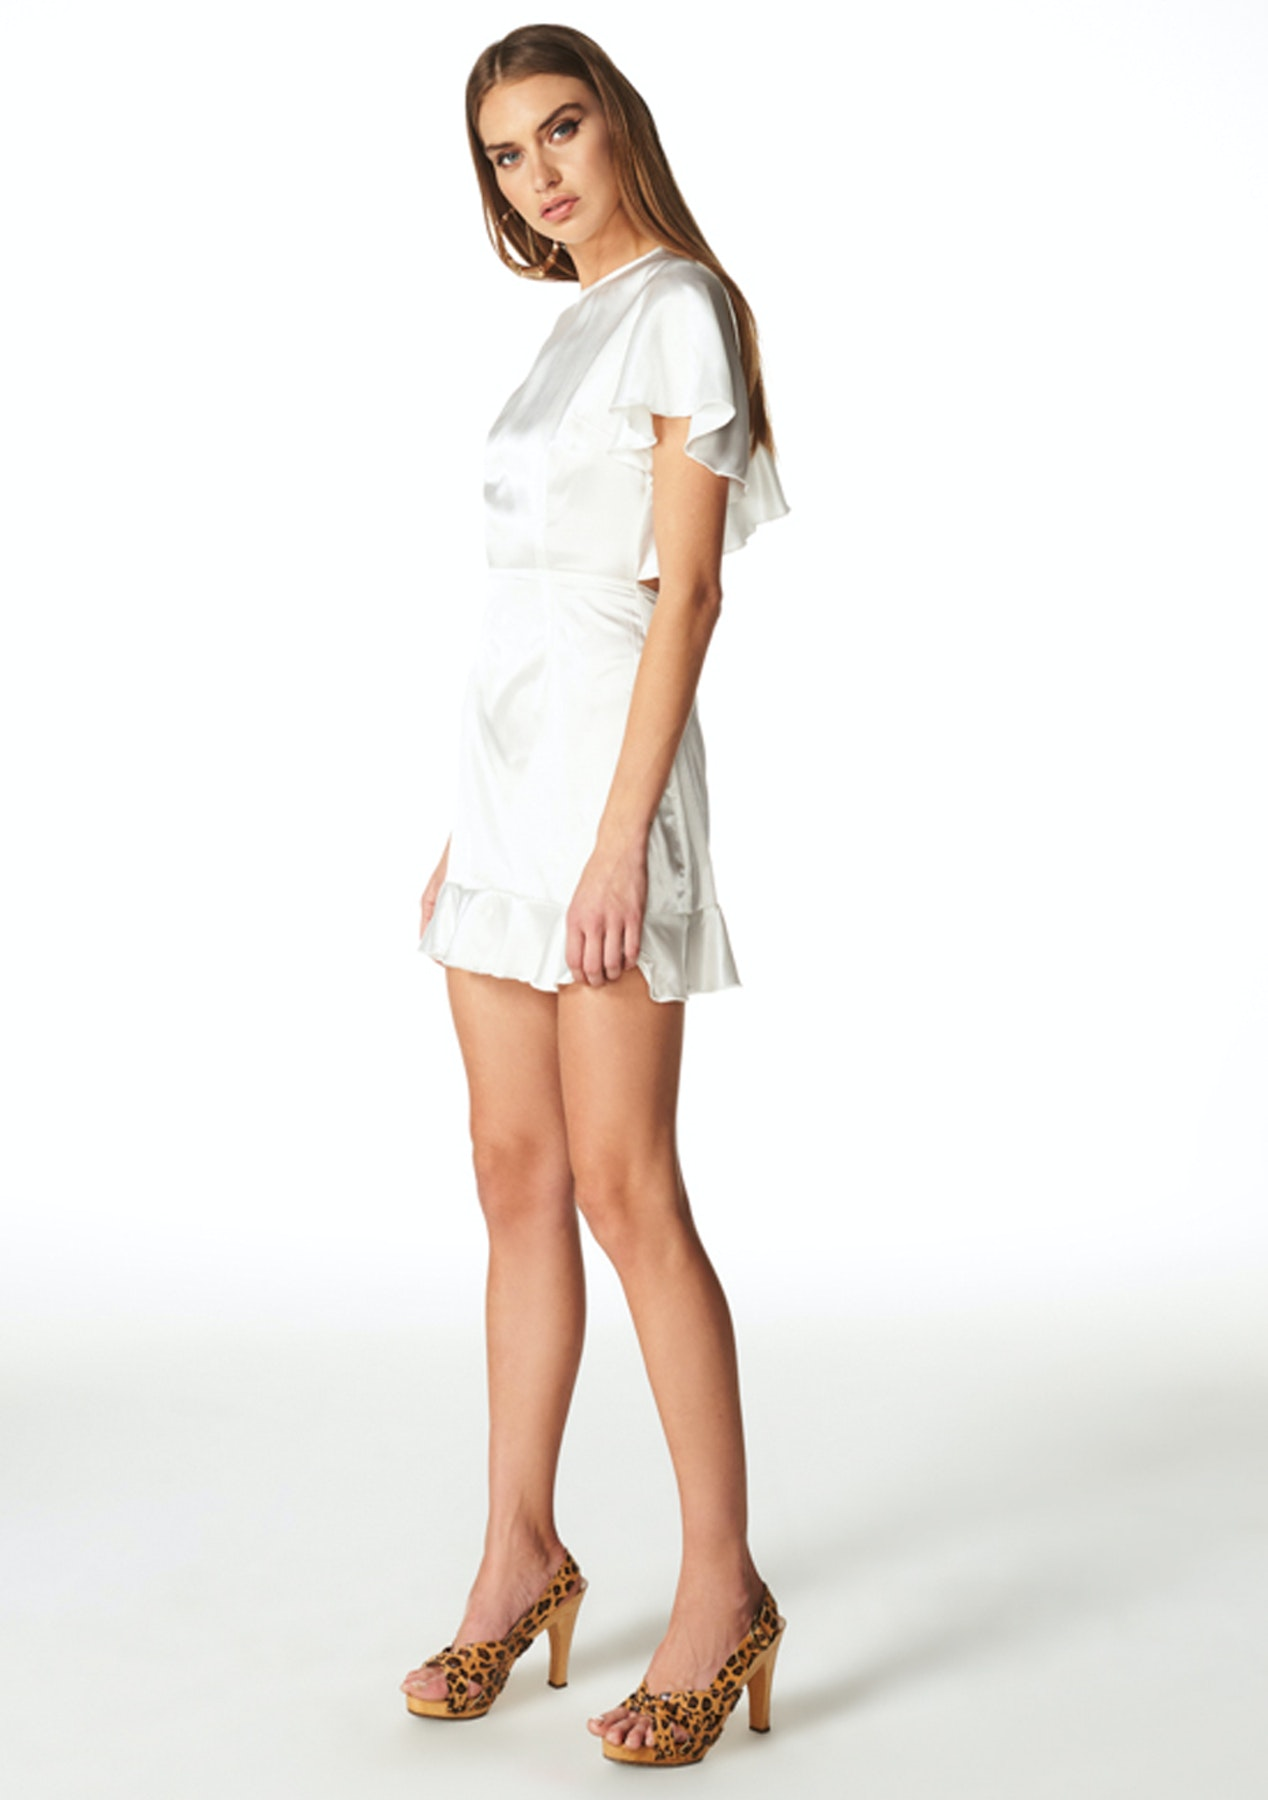 f4e501349c7c6 Lioness - Garden Party Dress - White